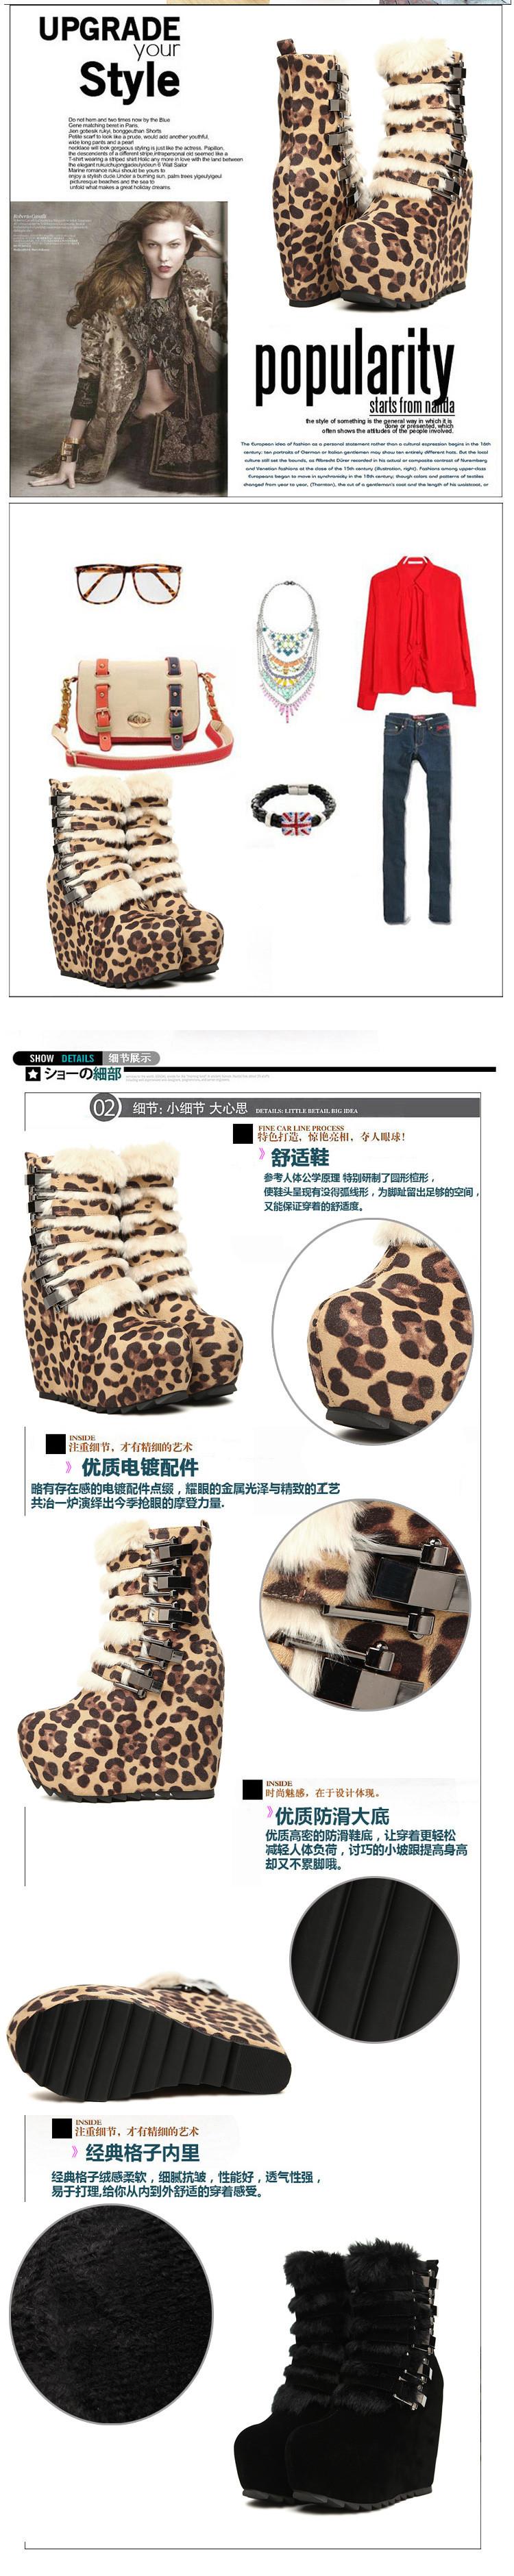 Женские ботинки Hasp xd018